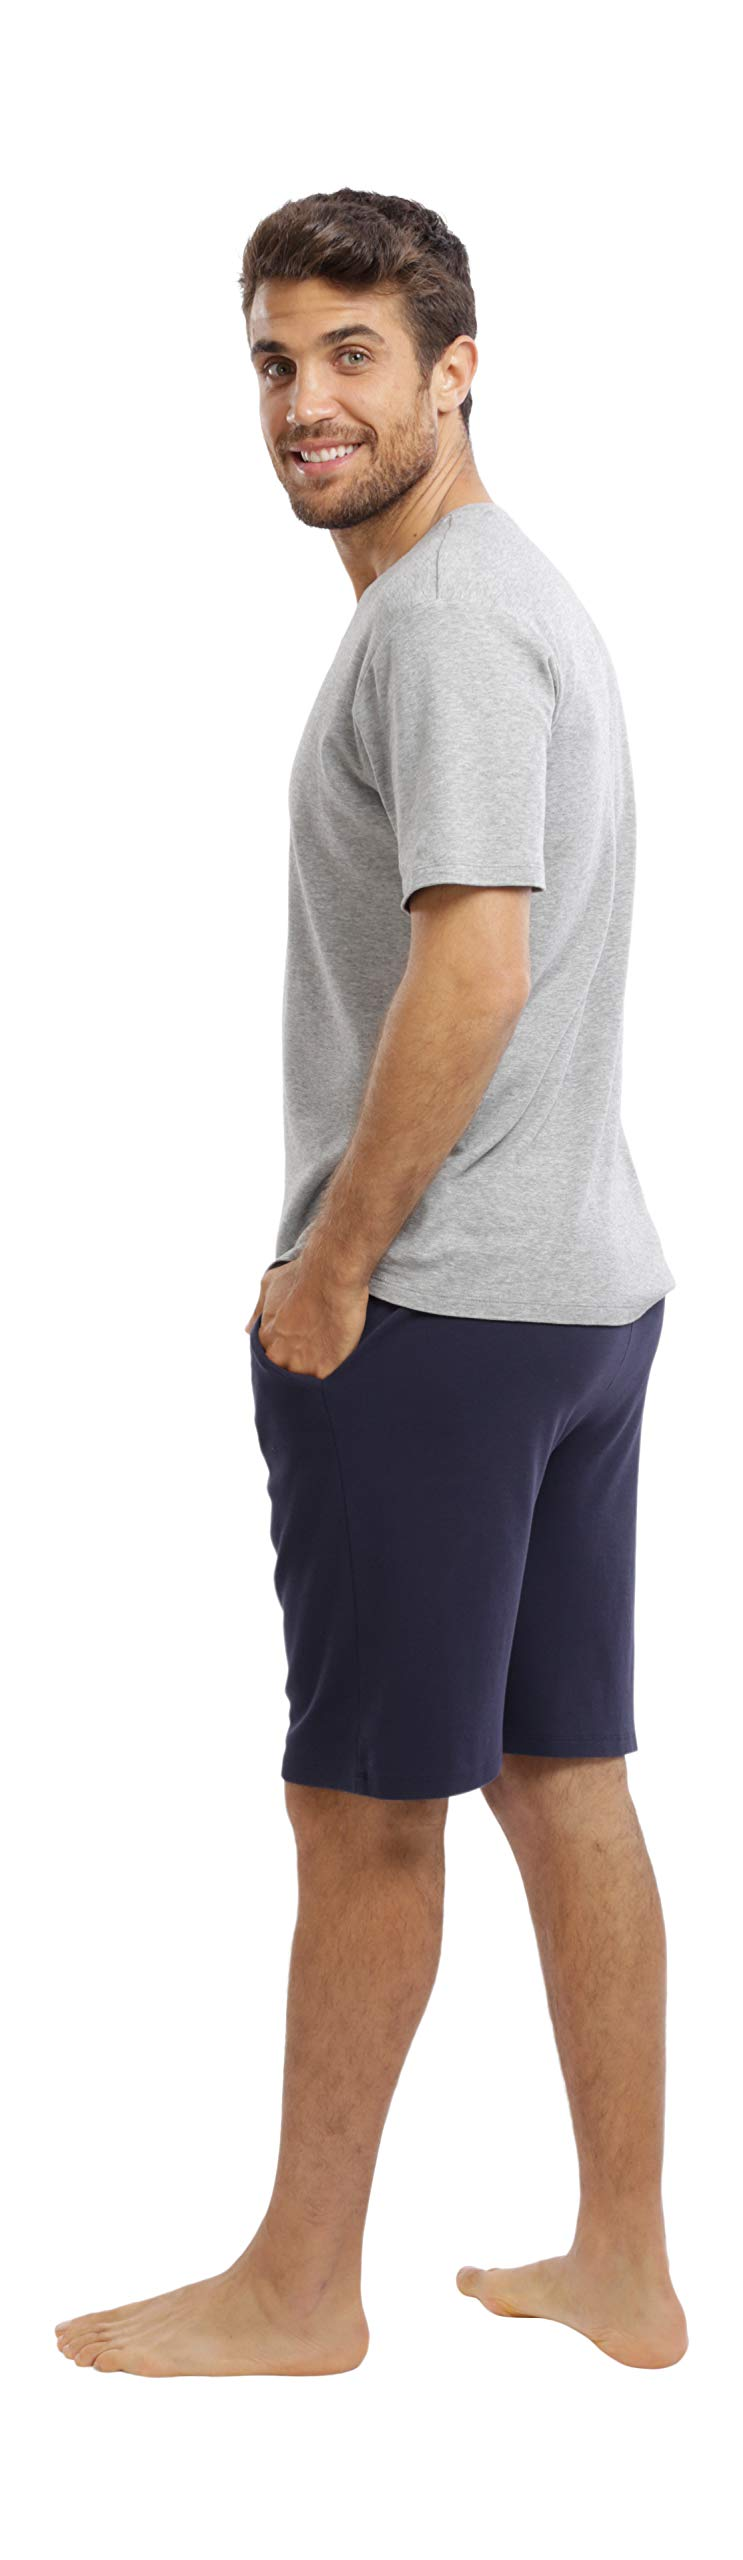 jijamas Incredibly Soft Pima Cotton Men's Pajamas Set - The Weekender Shorts in Navy and Heather Grey by jijamas (Image #2)